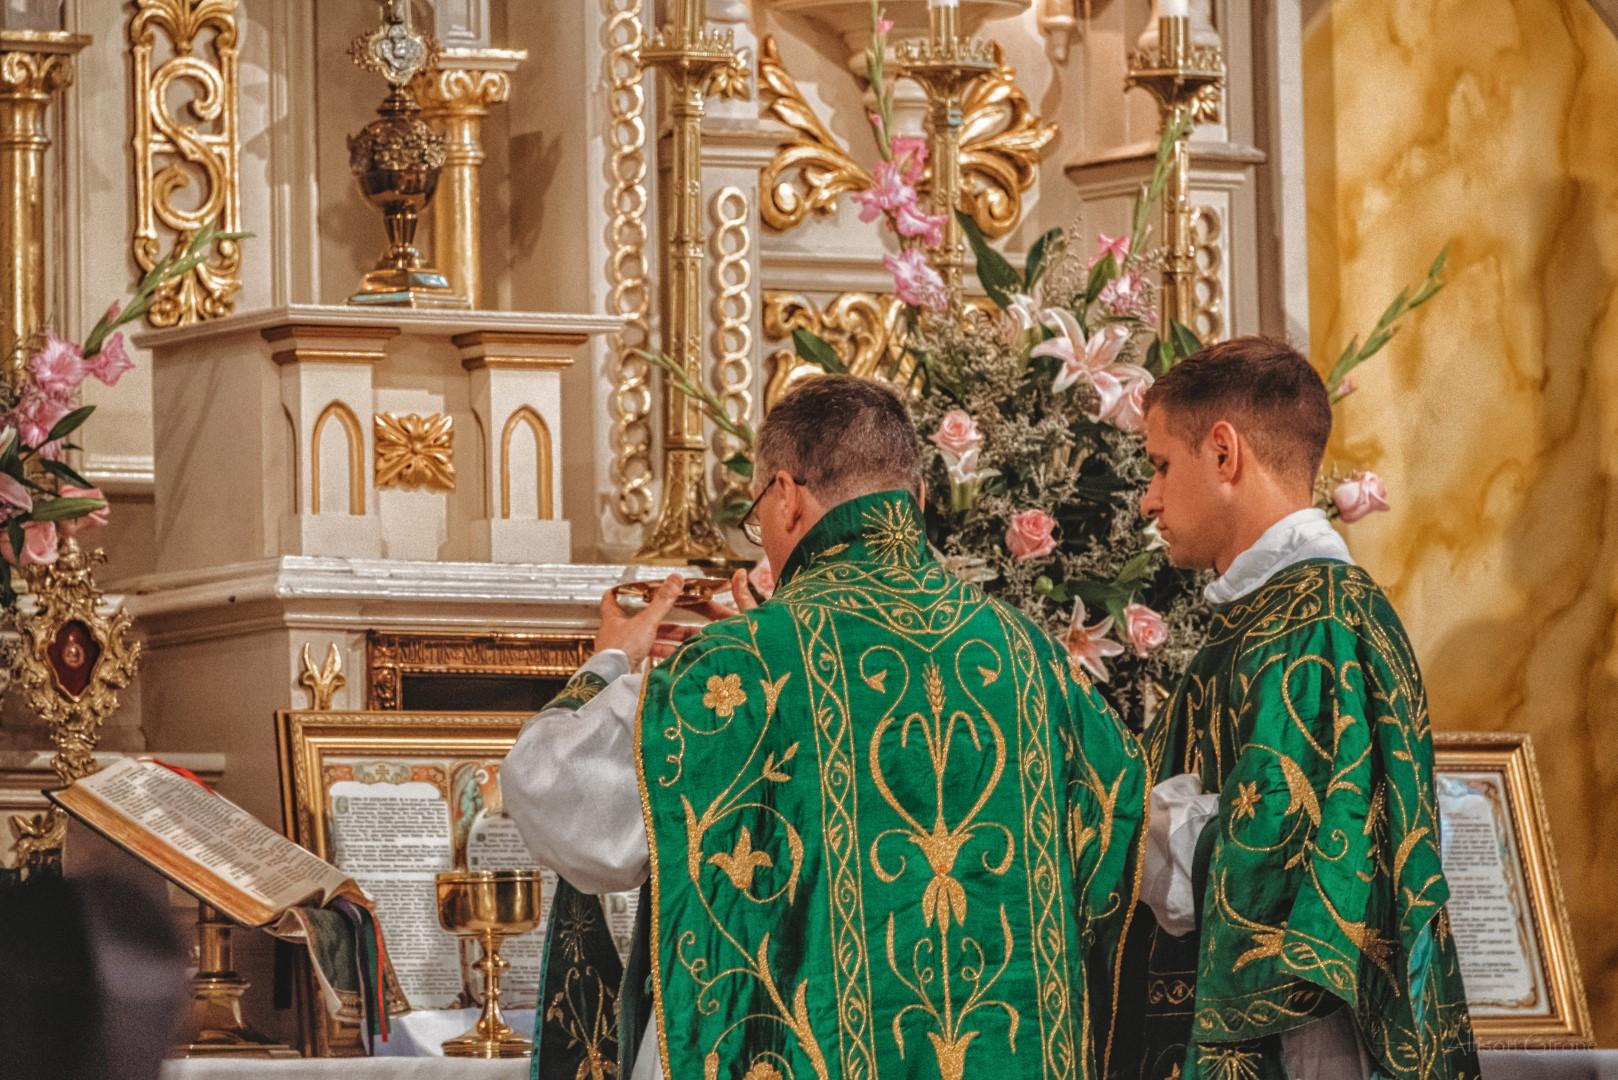 FSSP LatinMass St. Marys altar books paten-1.jpg